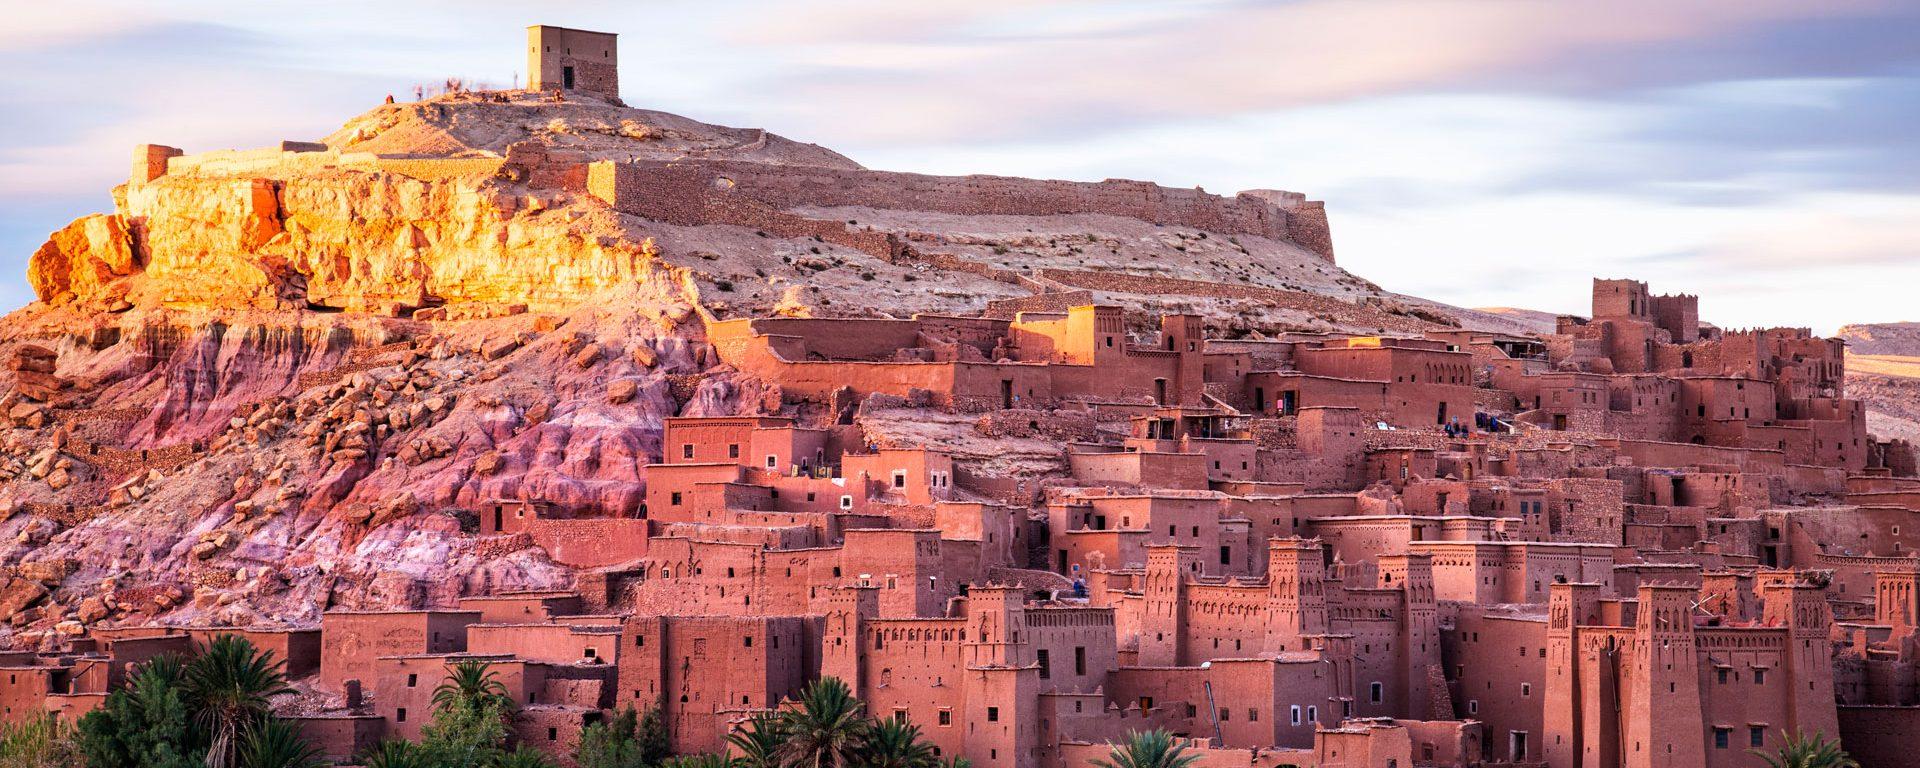 morocco-ouarzazate-ksar-ait-ben-haddou-architecture